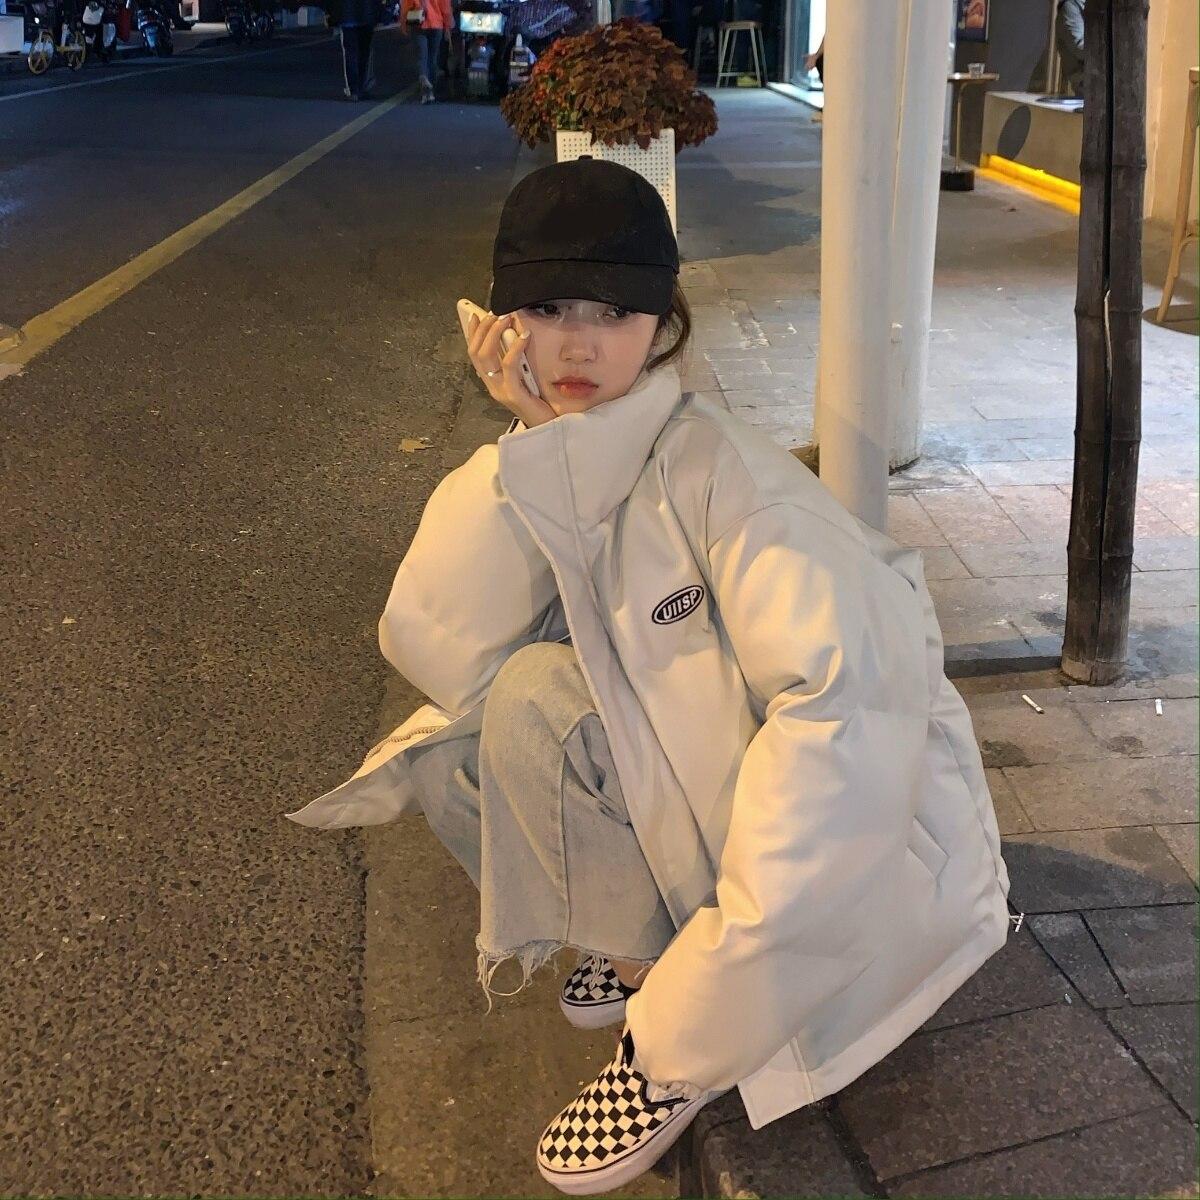 Down Parka Chic Jacket Skin Bread Down Cotton Padded Jacket Cotton Padded Jacket Women's Korean Vers